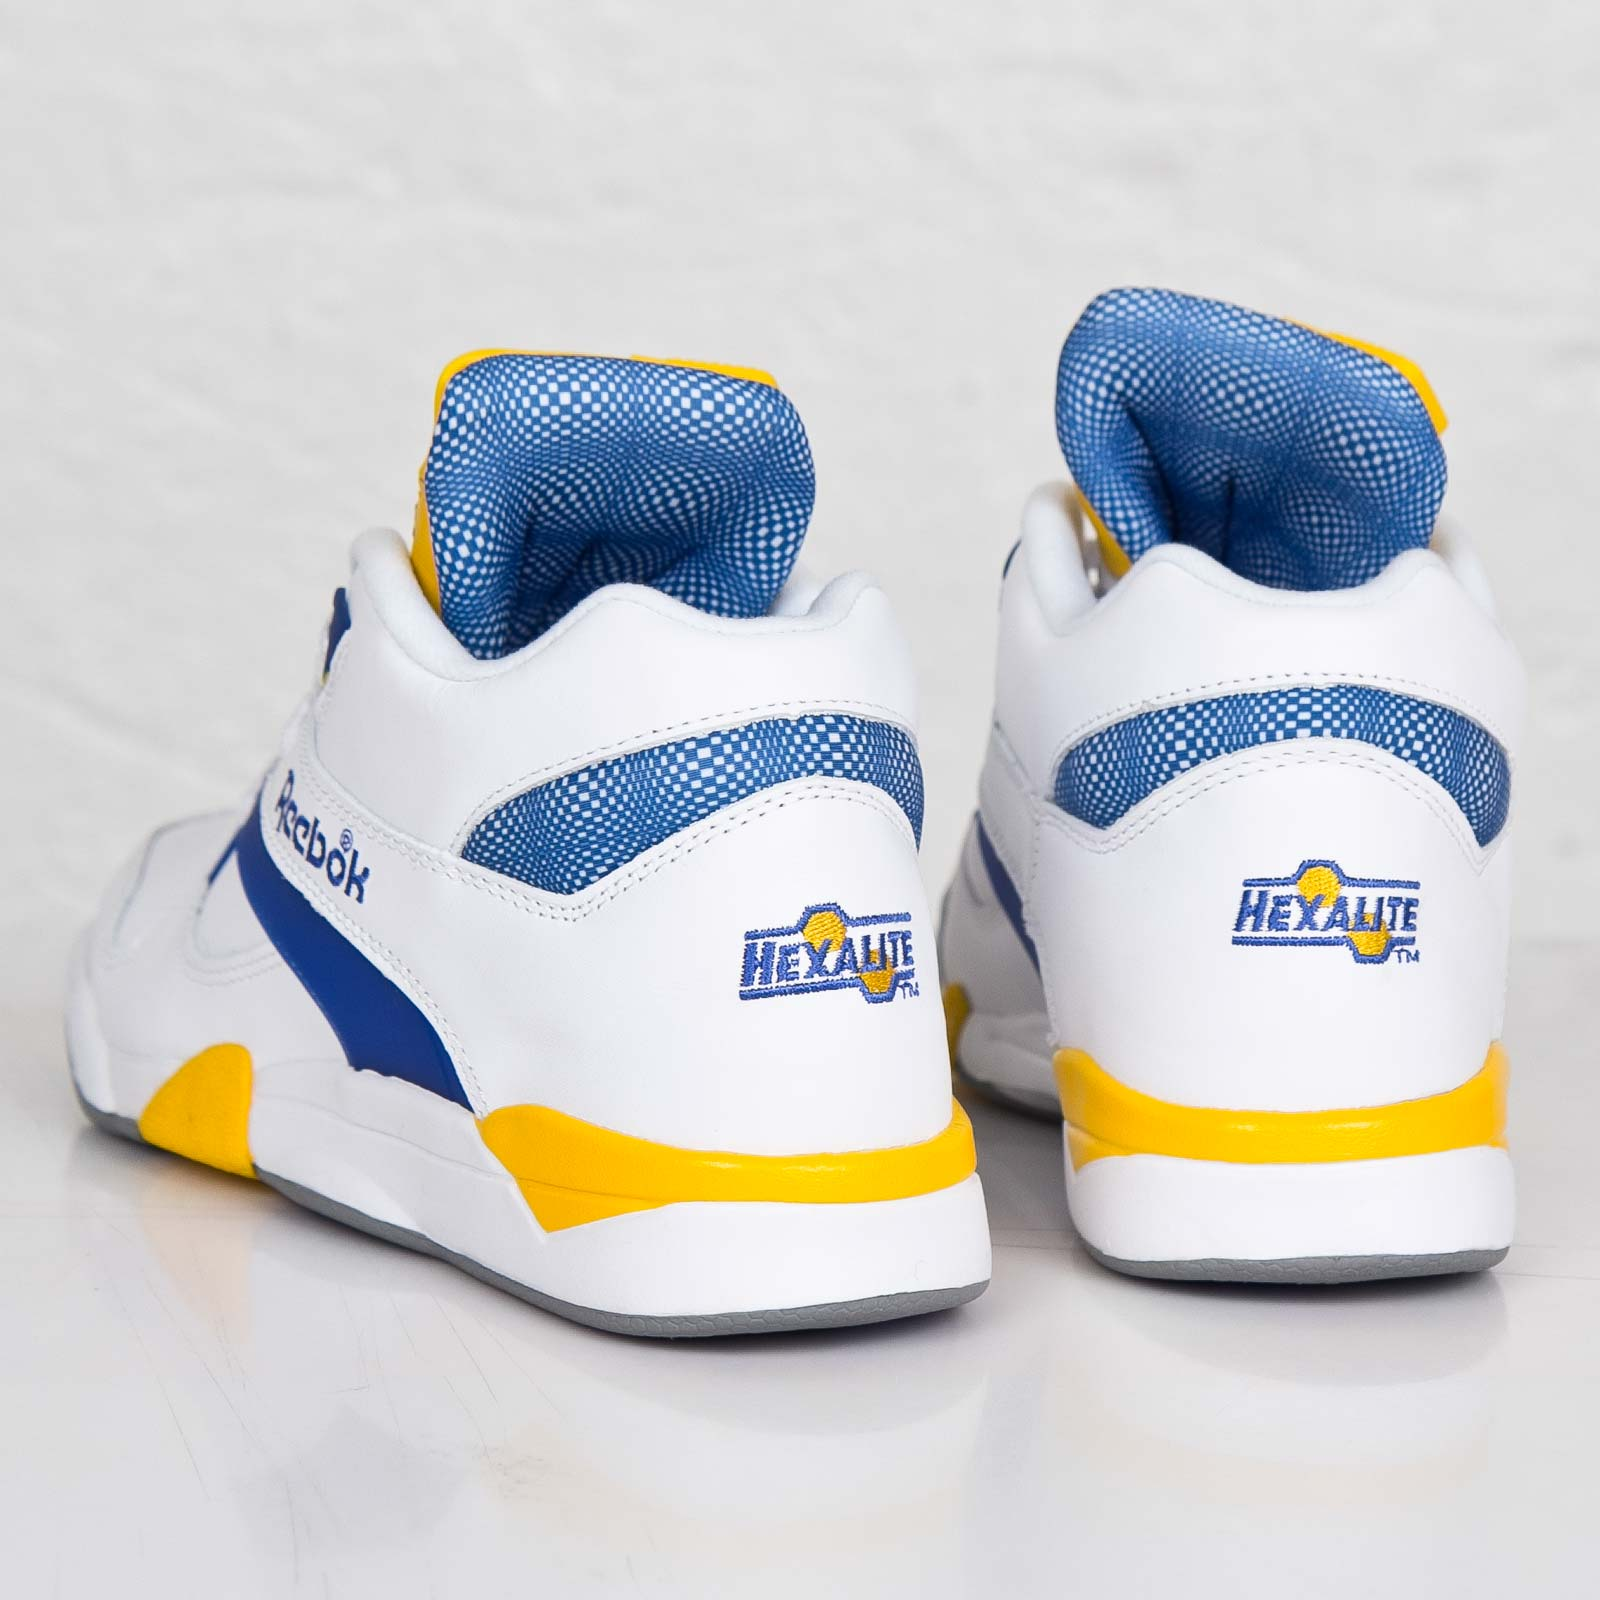 31bd0b21e5de Reebok Court Victory Pump - J14298 - Sneakersnstuff